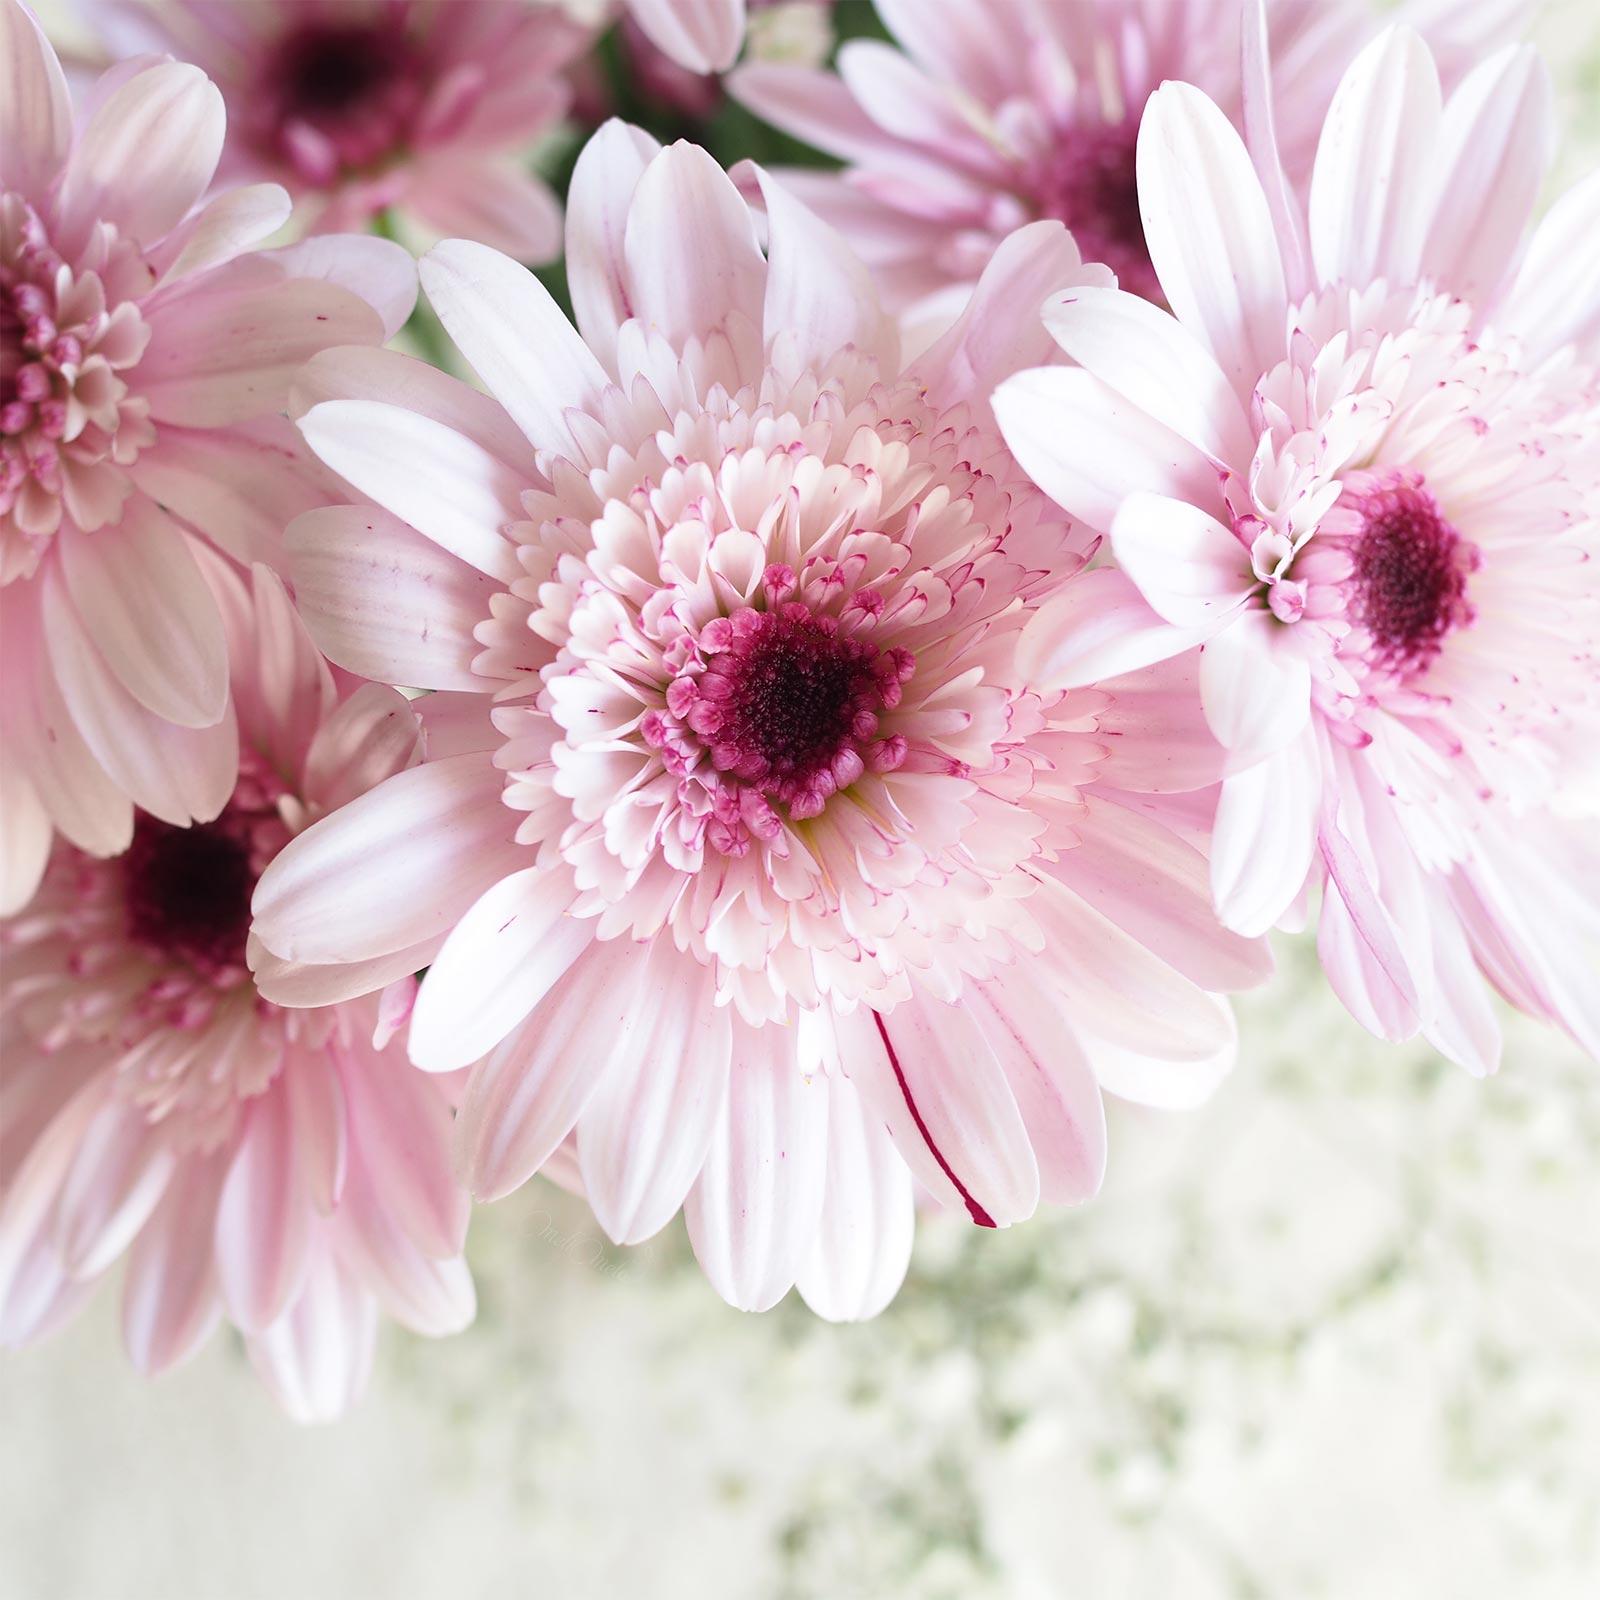 fleurs gerbera rose inspiration broderie Boutique MeliMelo